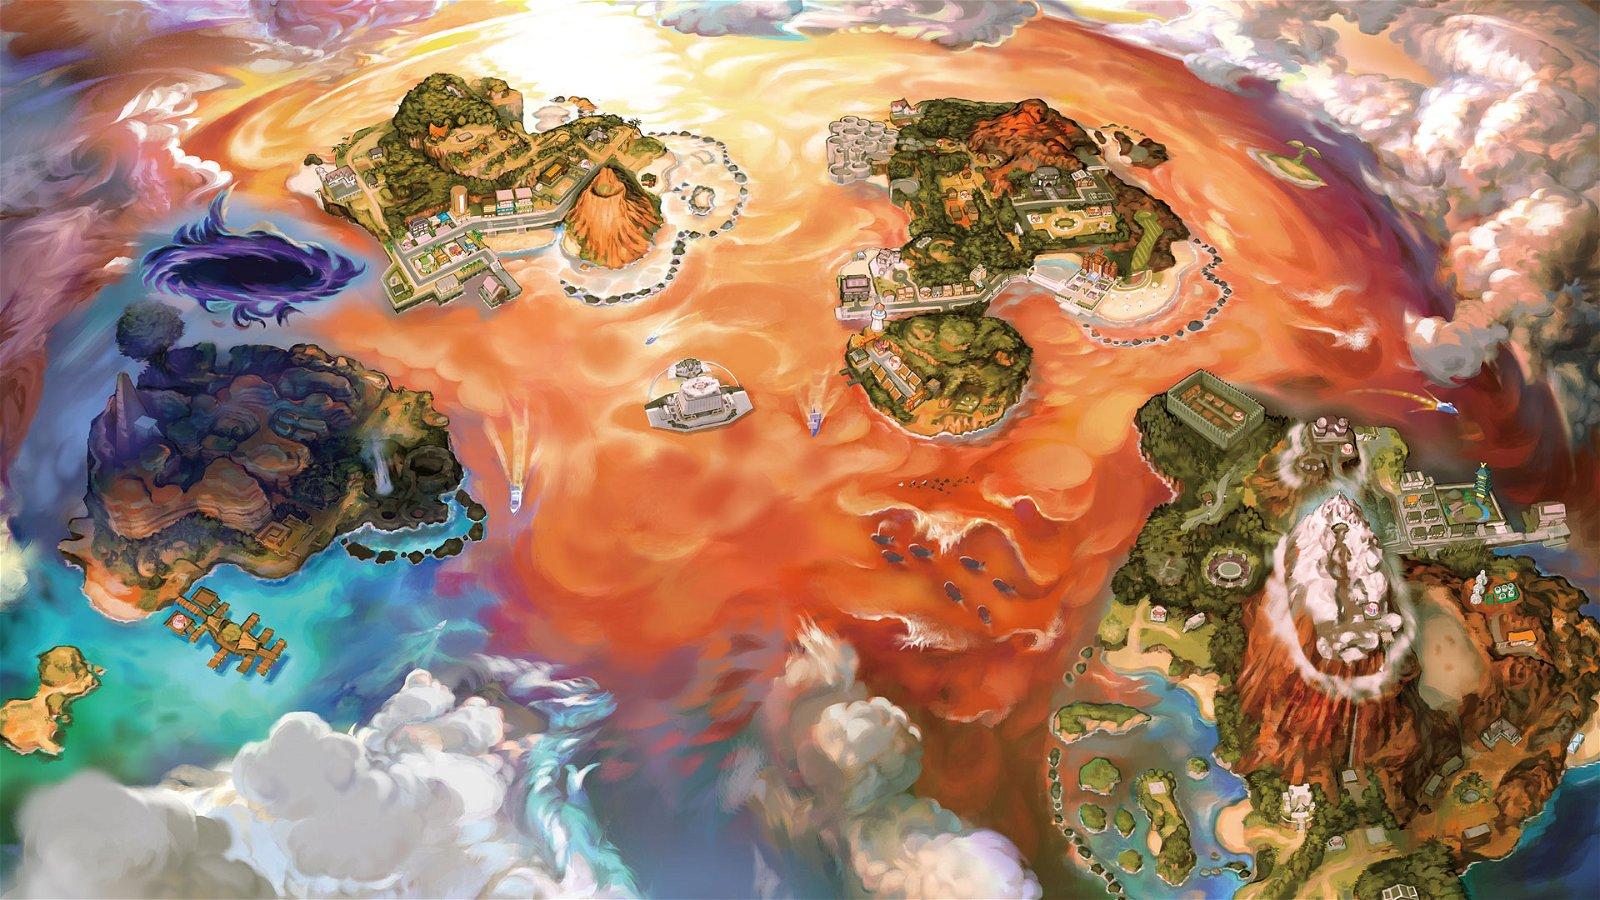 Pokémon Ultra Sun (3DS) Review - Ultra Fun in the Ultra Sun 2